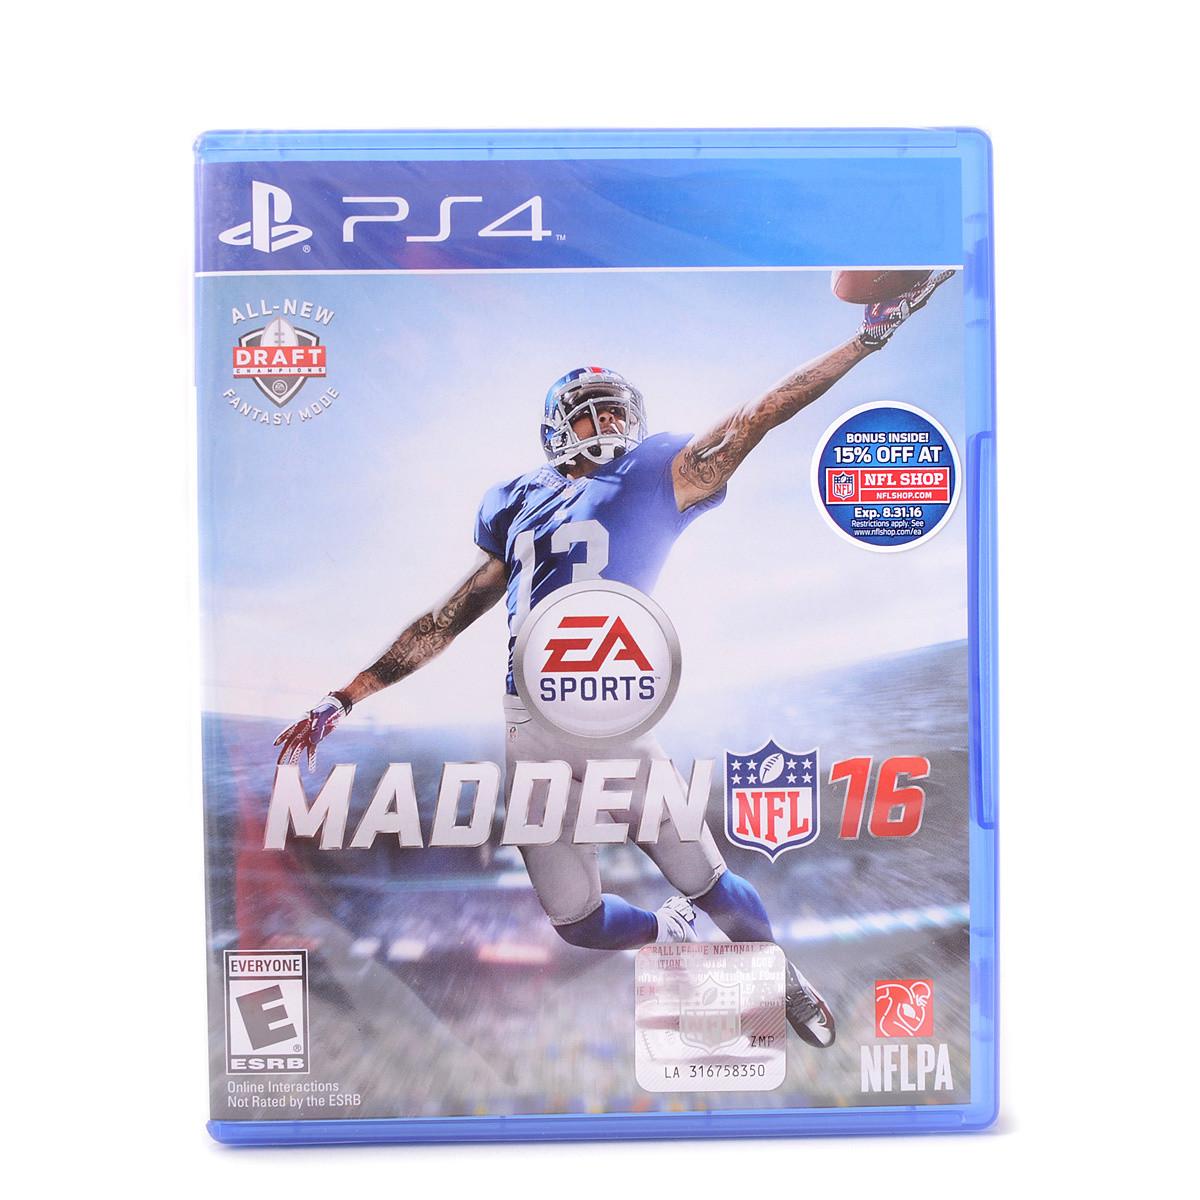 Madden NFL 16 (PS4)